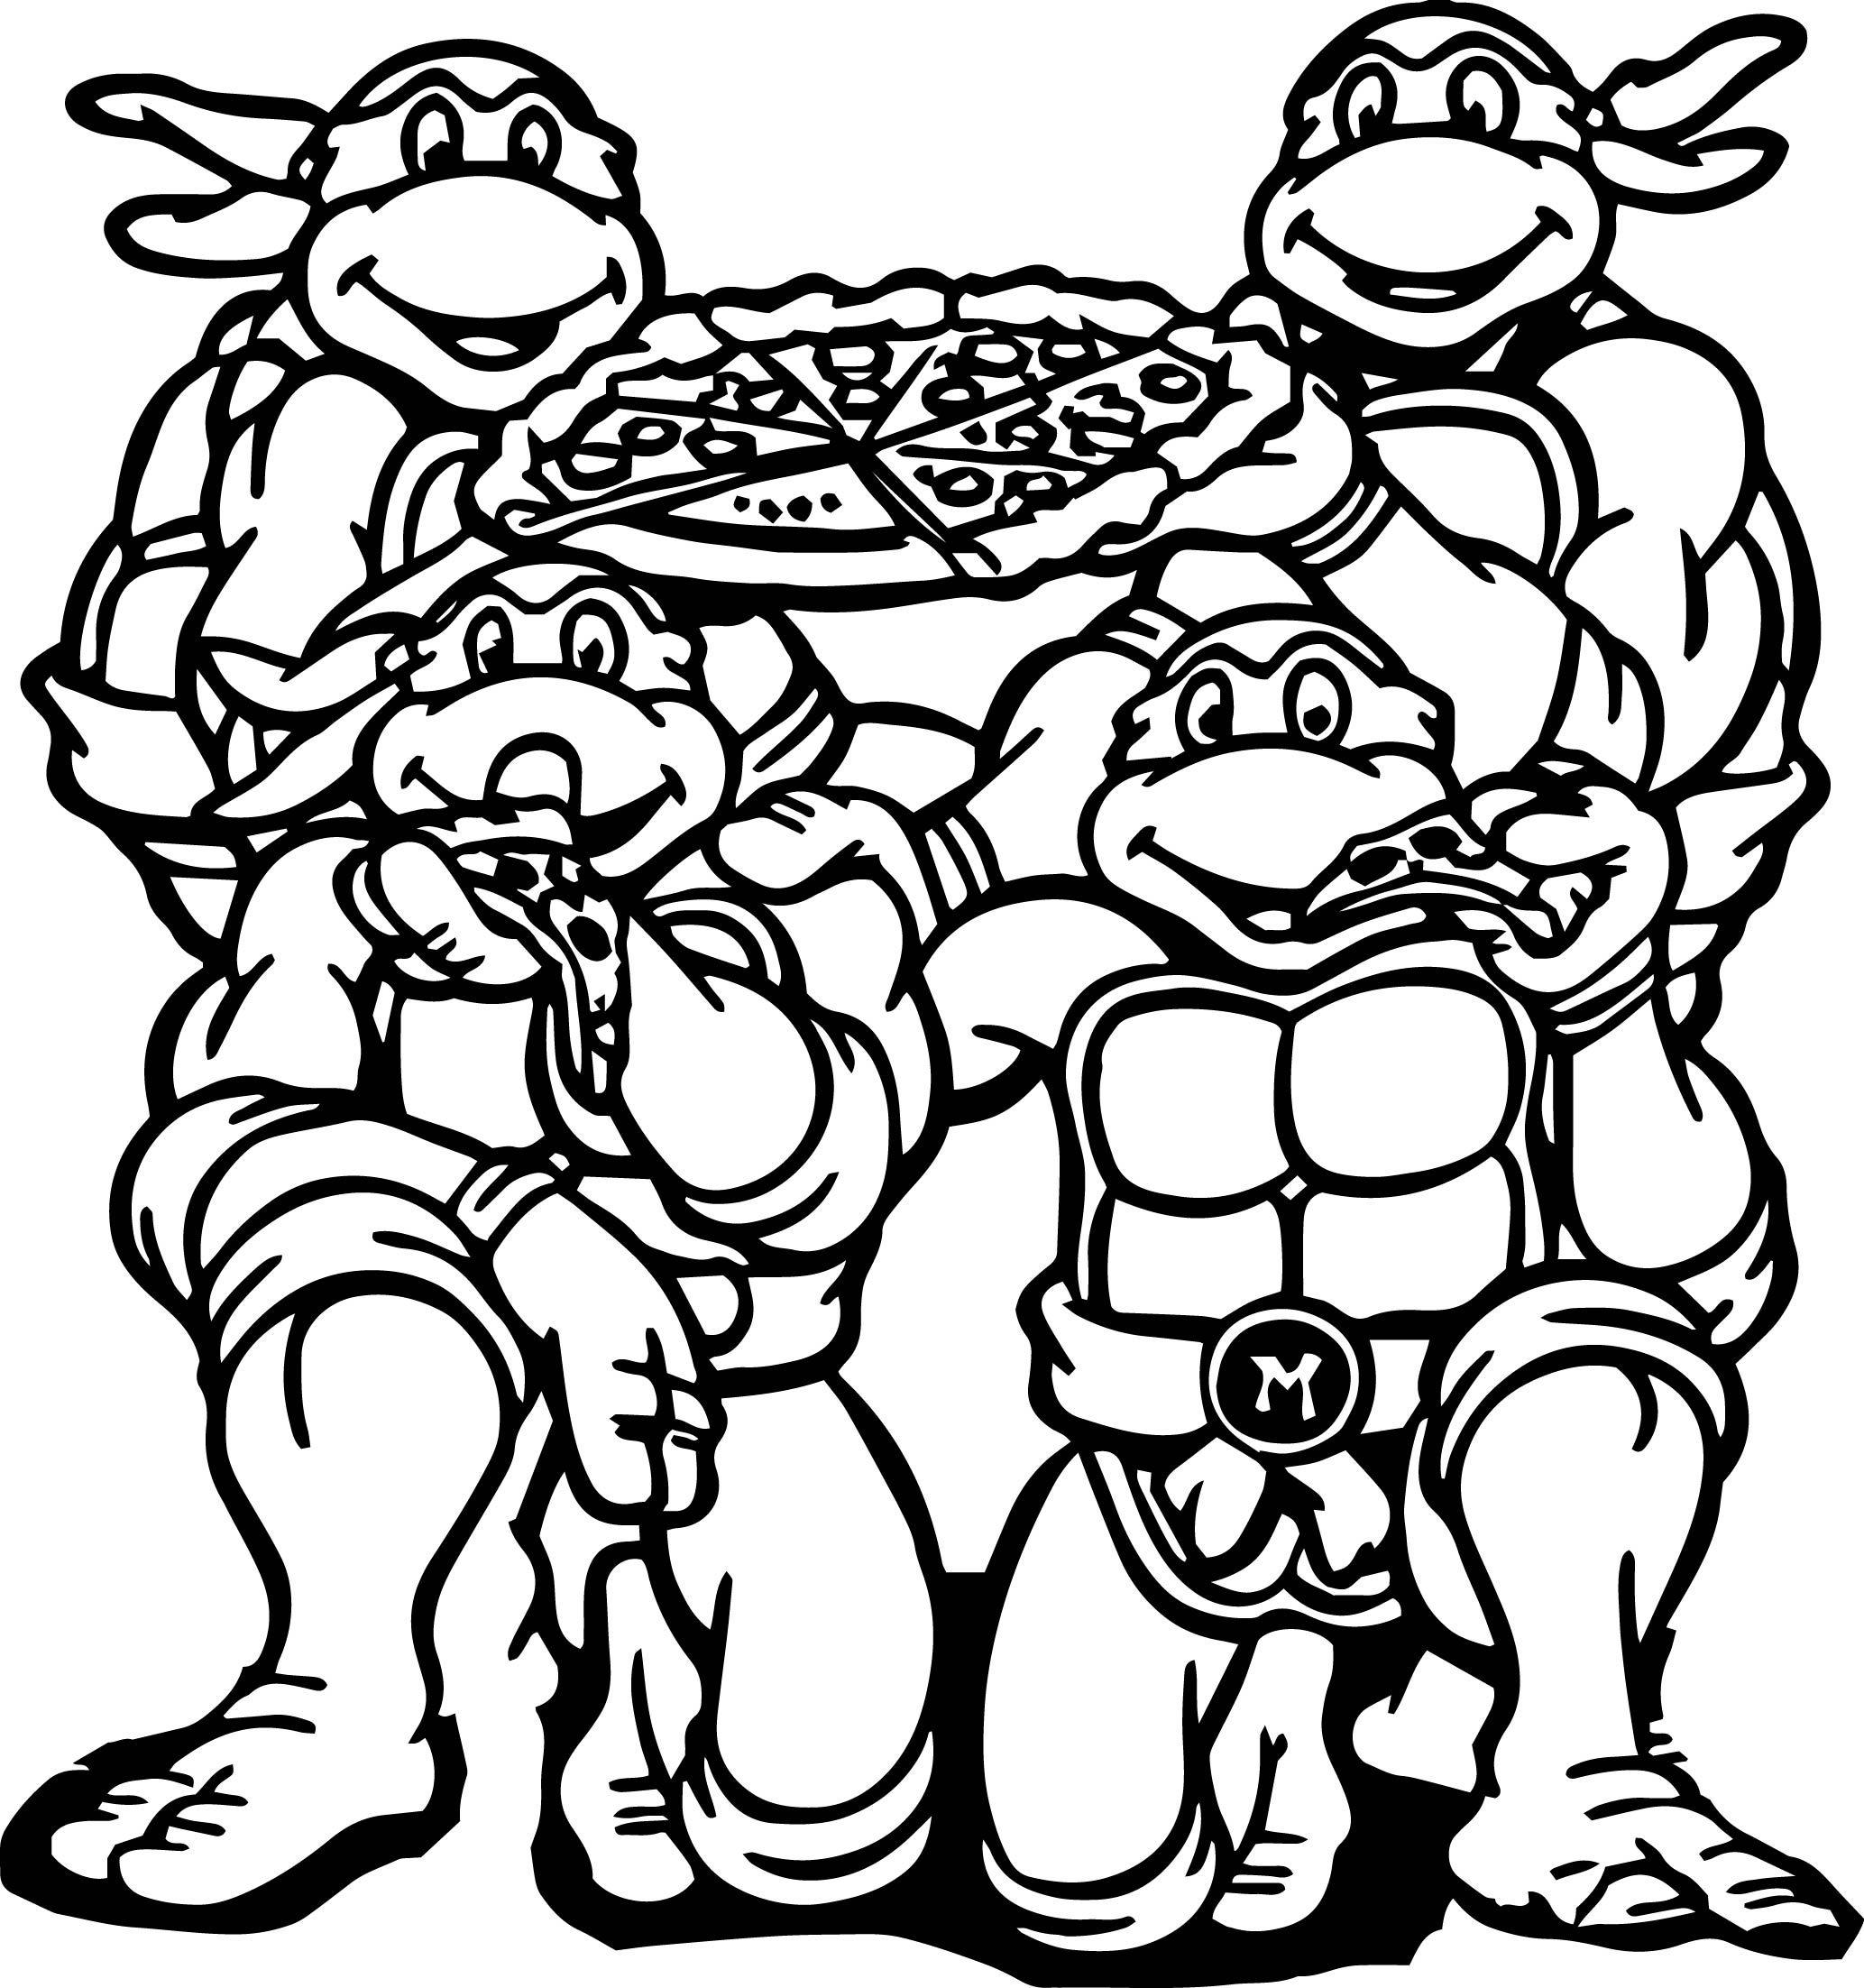 2067x2204 Teenage Mutant Ninja Turtles Coloring Pages To Print